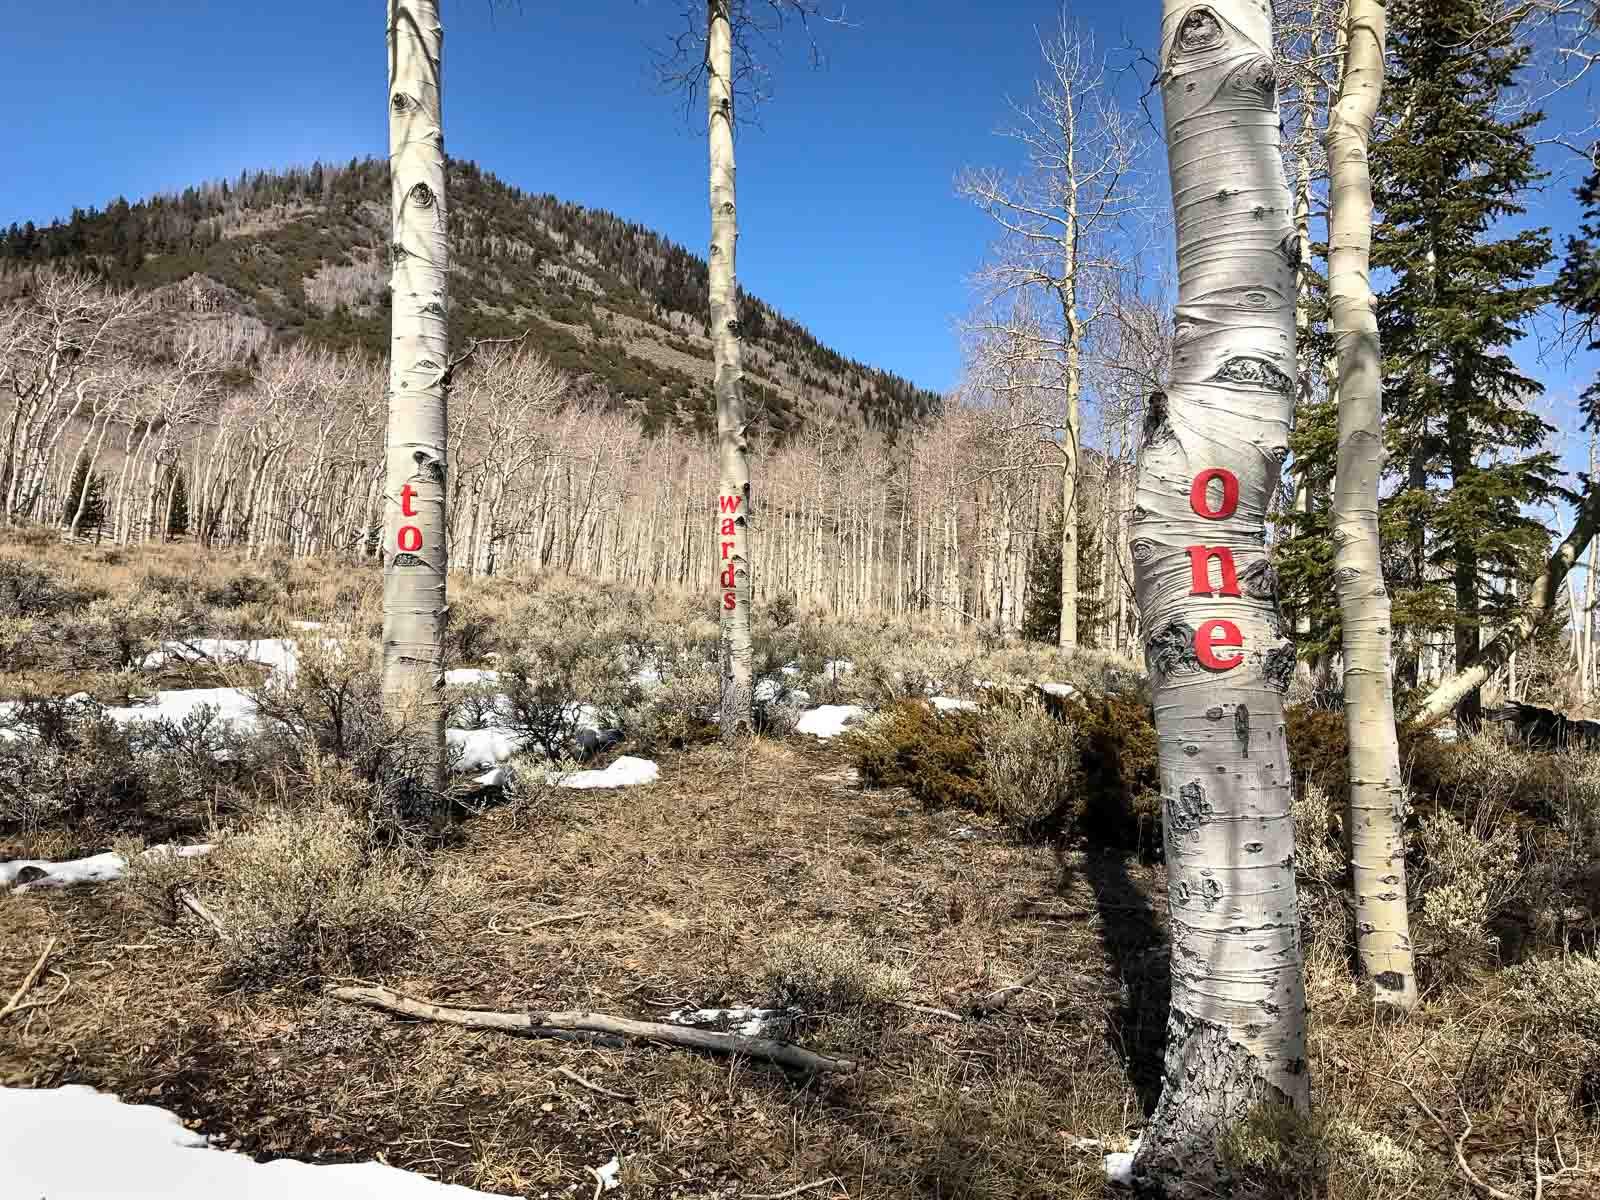 Pando Forest, Utah, 2018